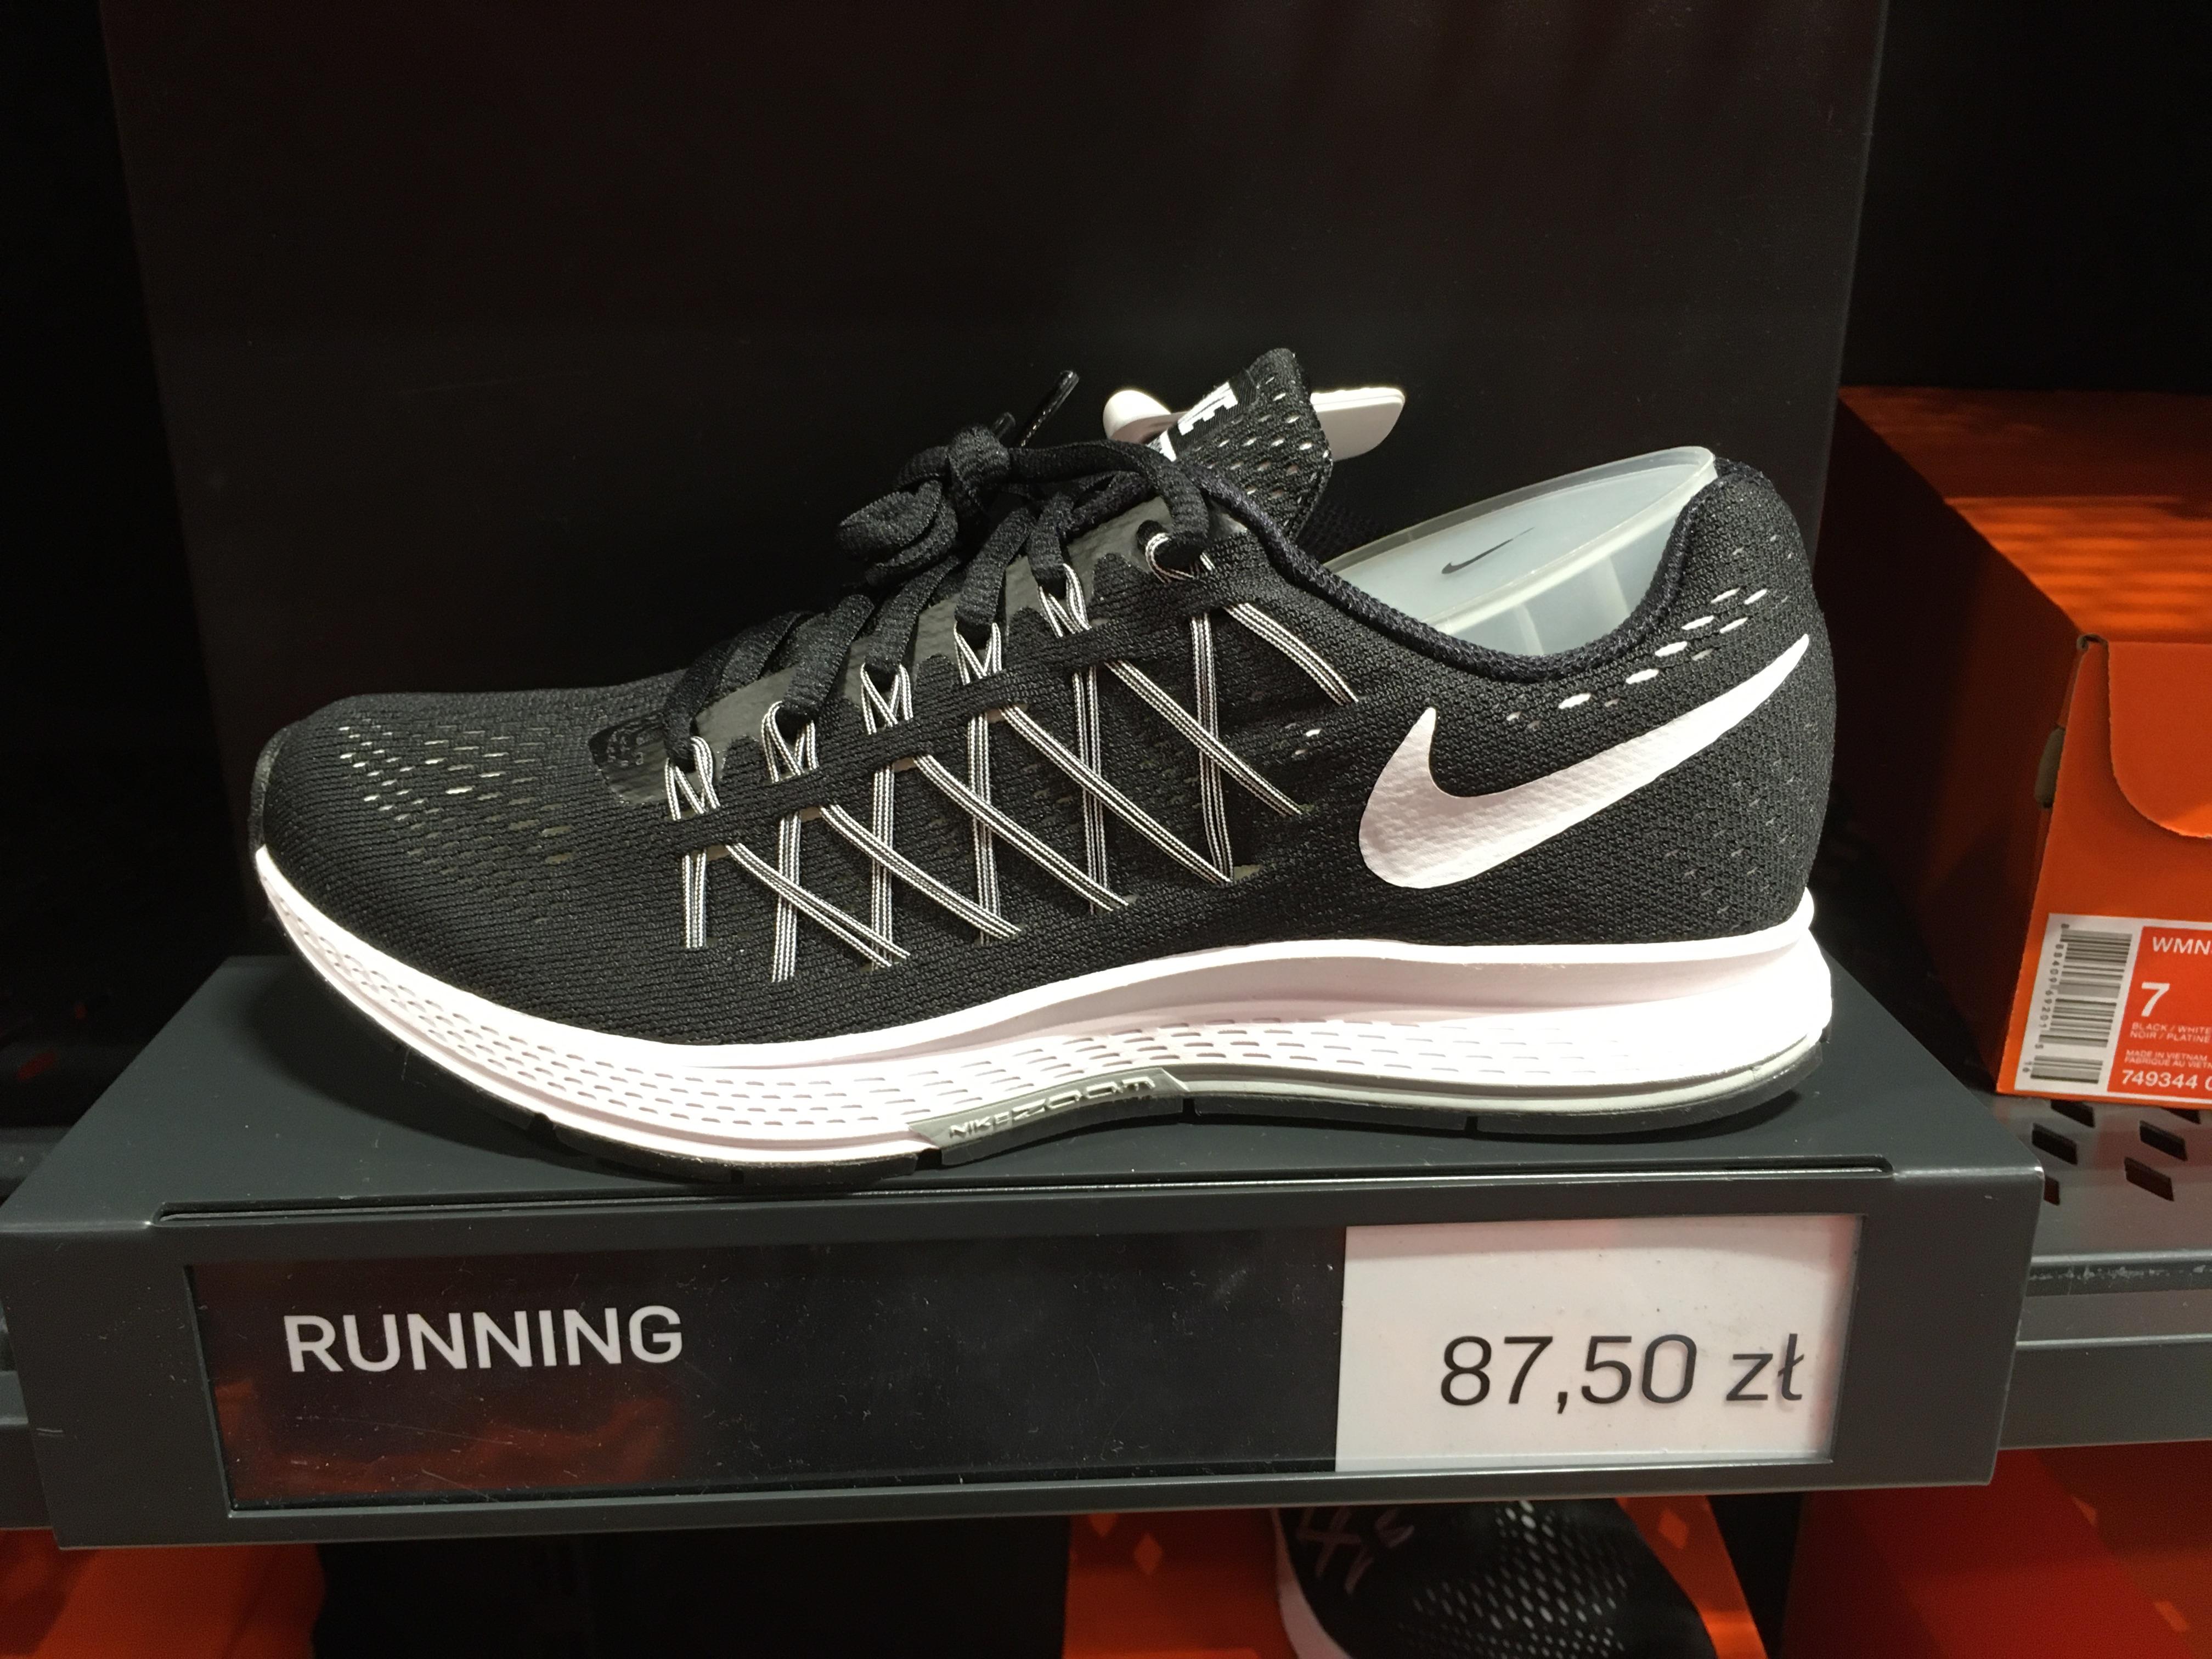 Nike Air Zoom Pegasus 32 buty damskie do biegania @ Nike (Faktory Wrocław)